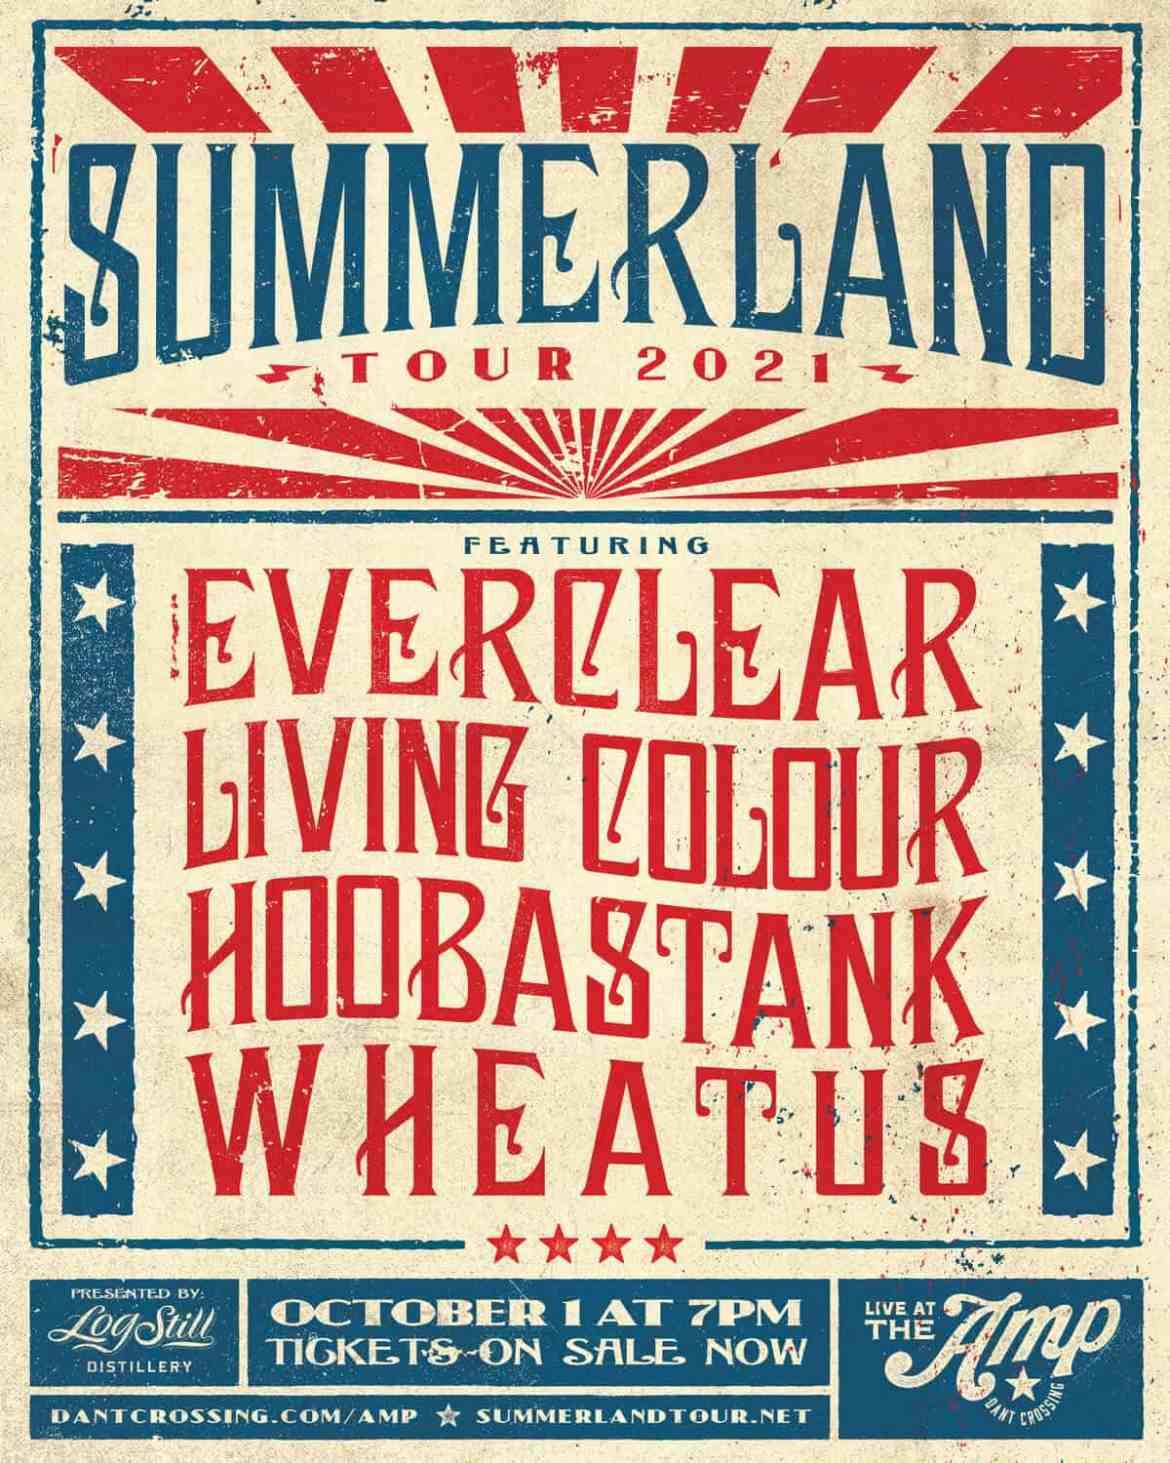 Summerland - Summerland Tour 2021 Presented by Log Still Distillery